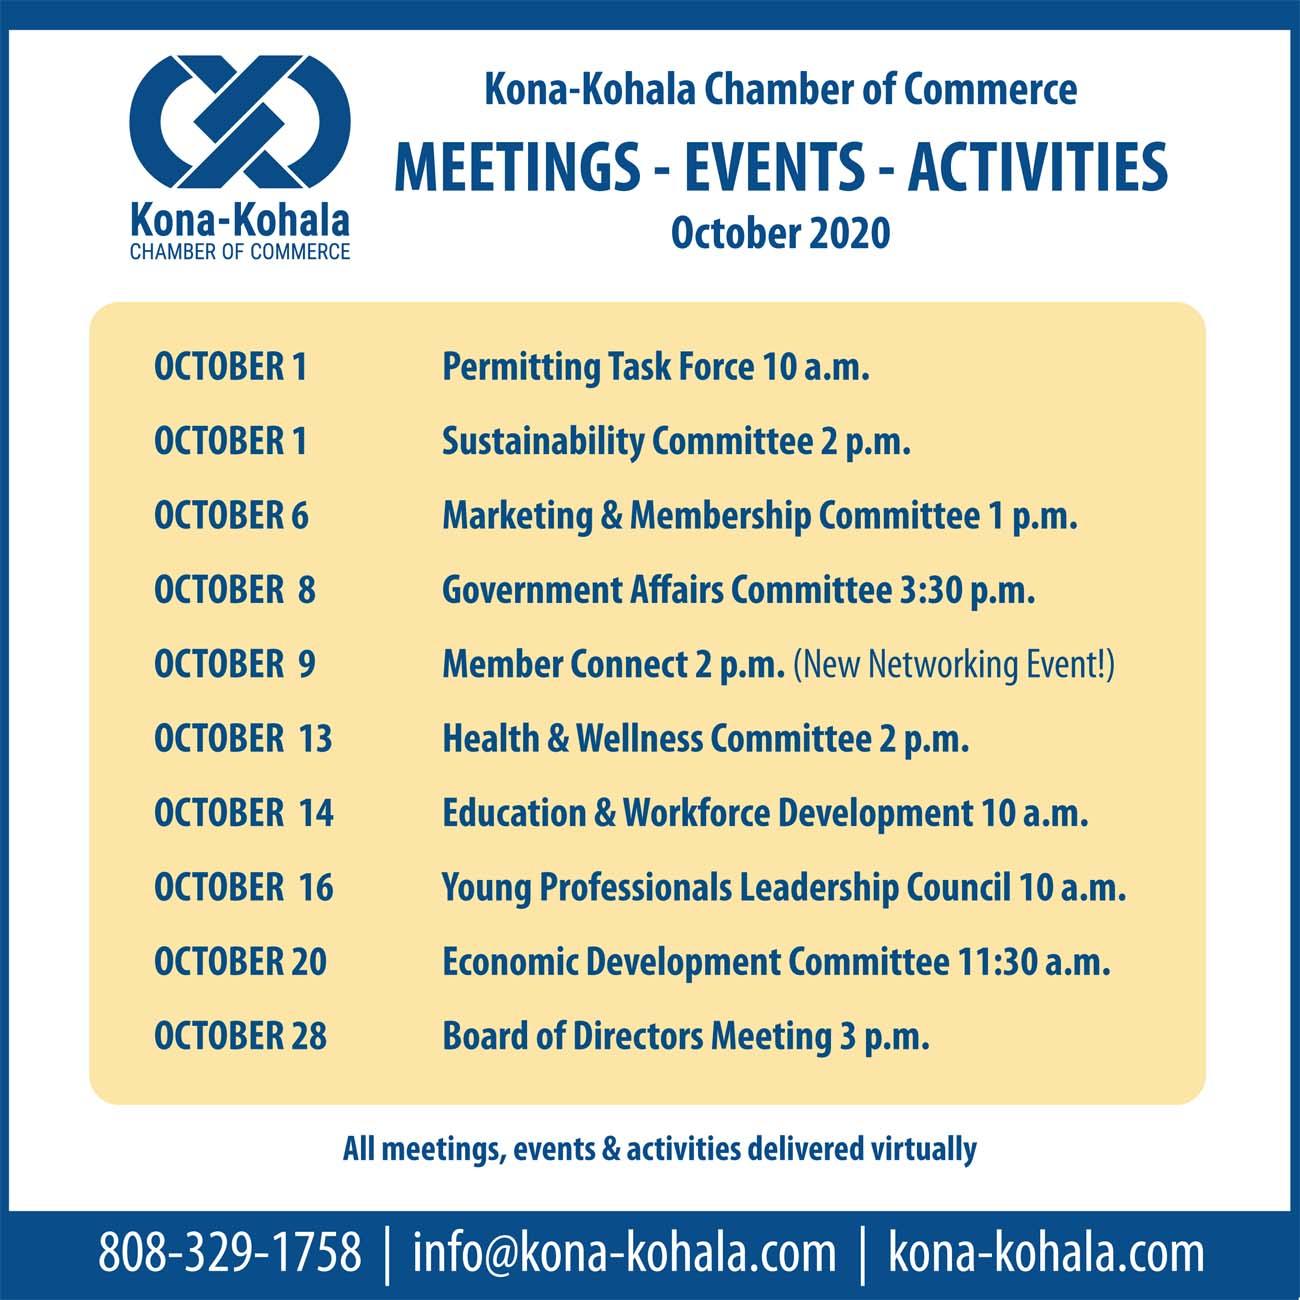 KKCC-Events---October-2020---Square-b.jpg